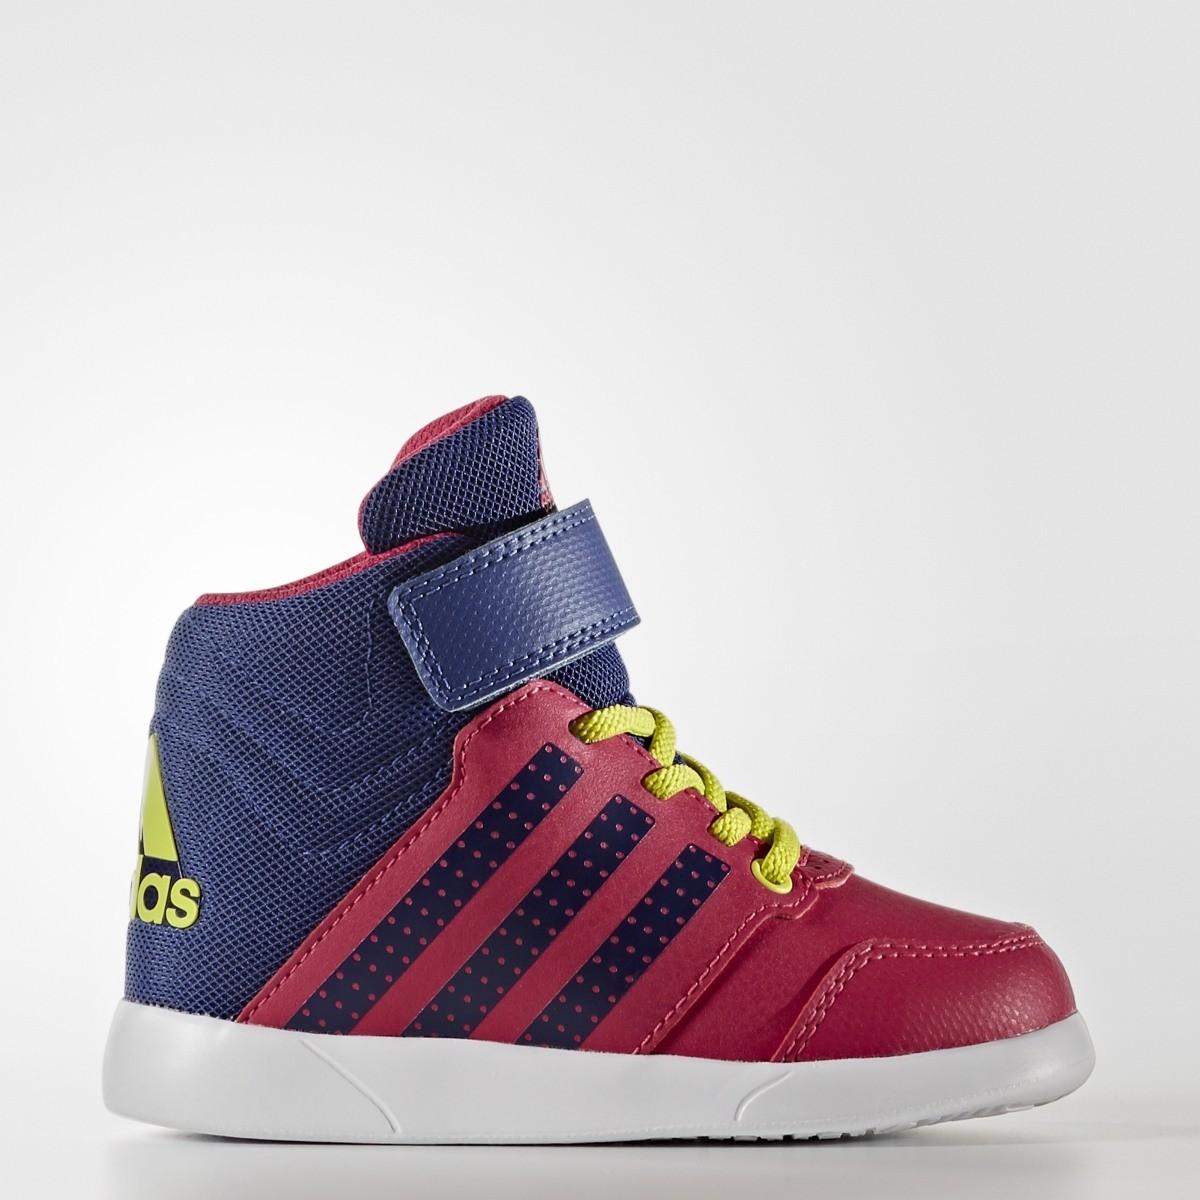 a31be5596fc Dětské tenisky adidas Jan BS 2 mid I